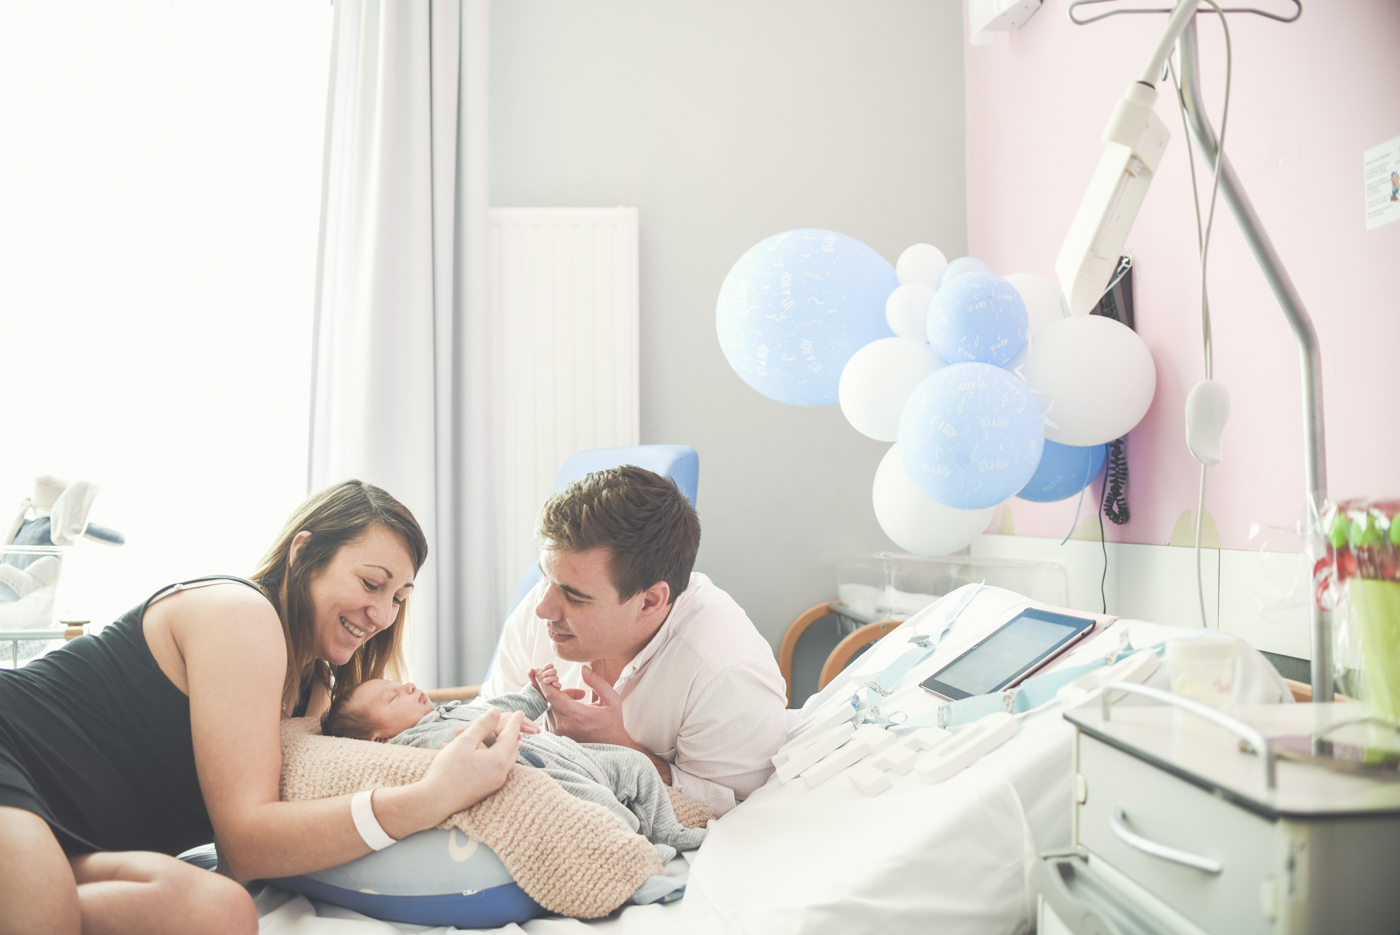 portfolio-fotos-bebes-recien-nacidos-ninos-mia-moments-hospitalbrugman-02.jpg